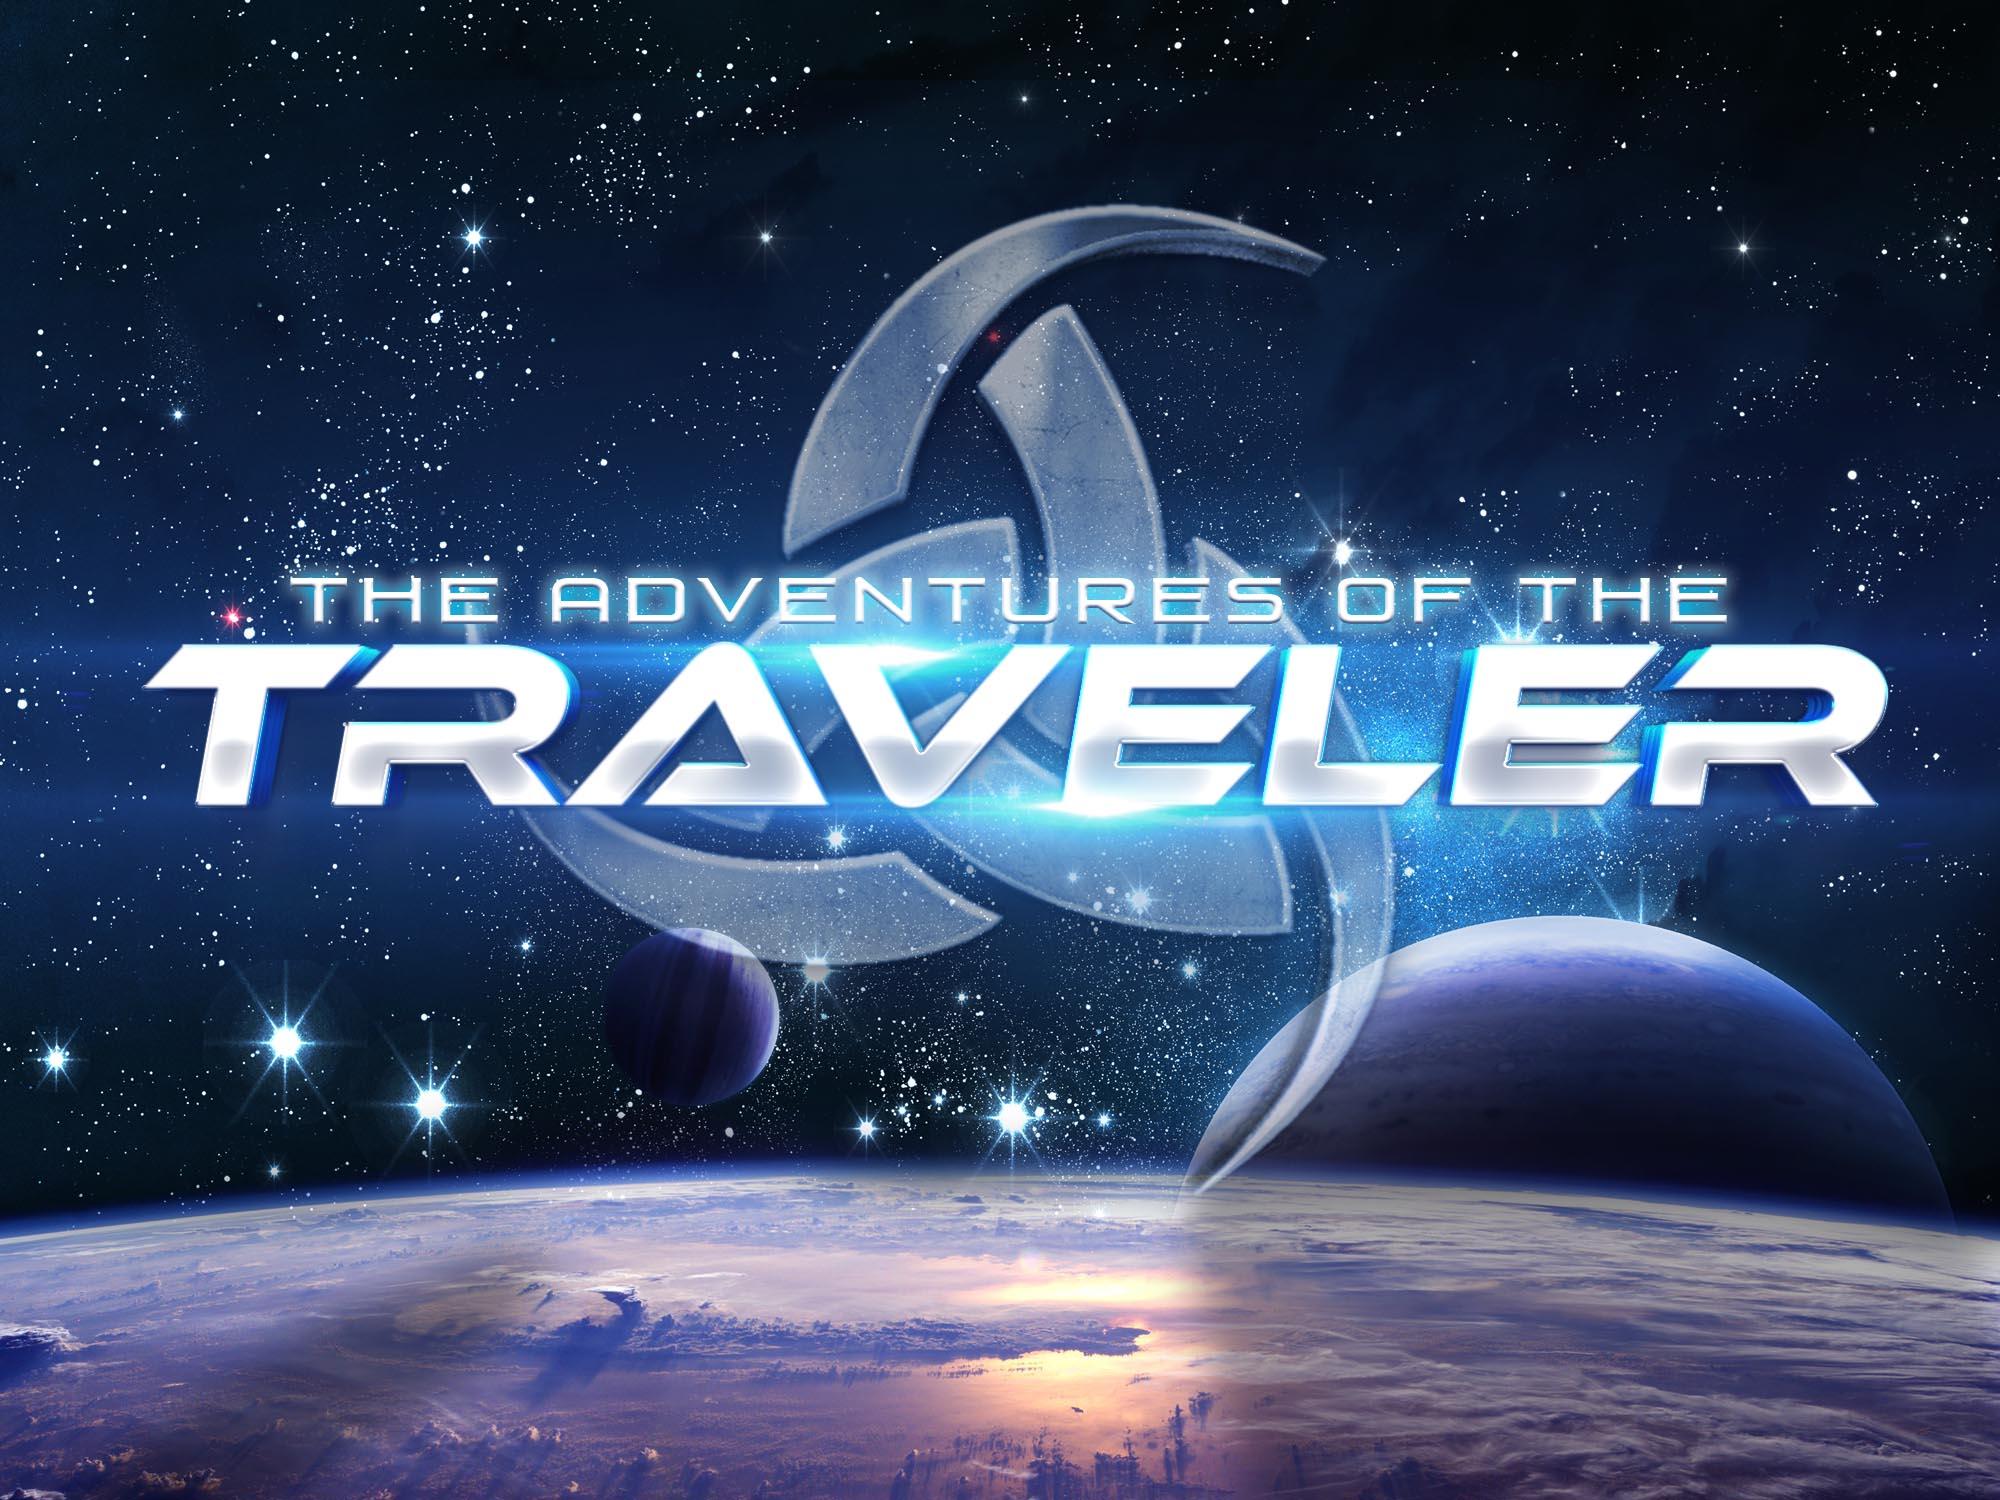 Adventures of the Traveler Promo